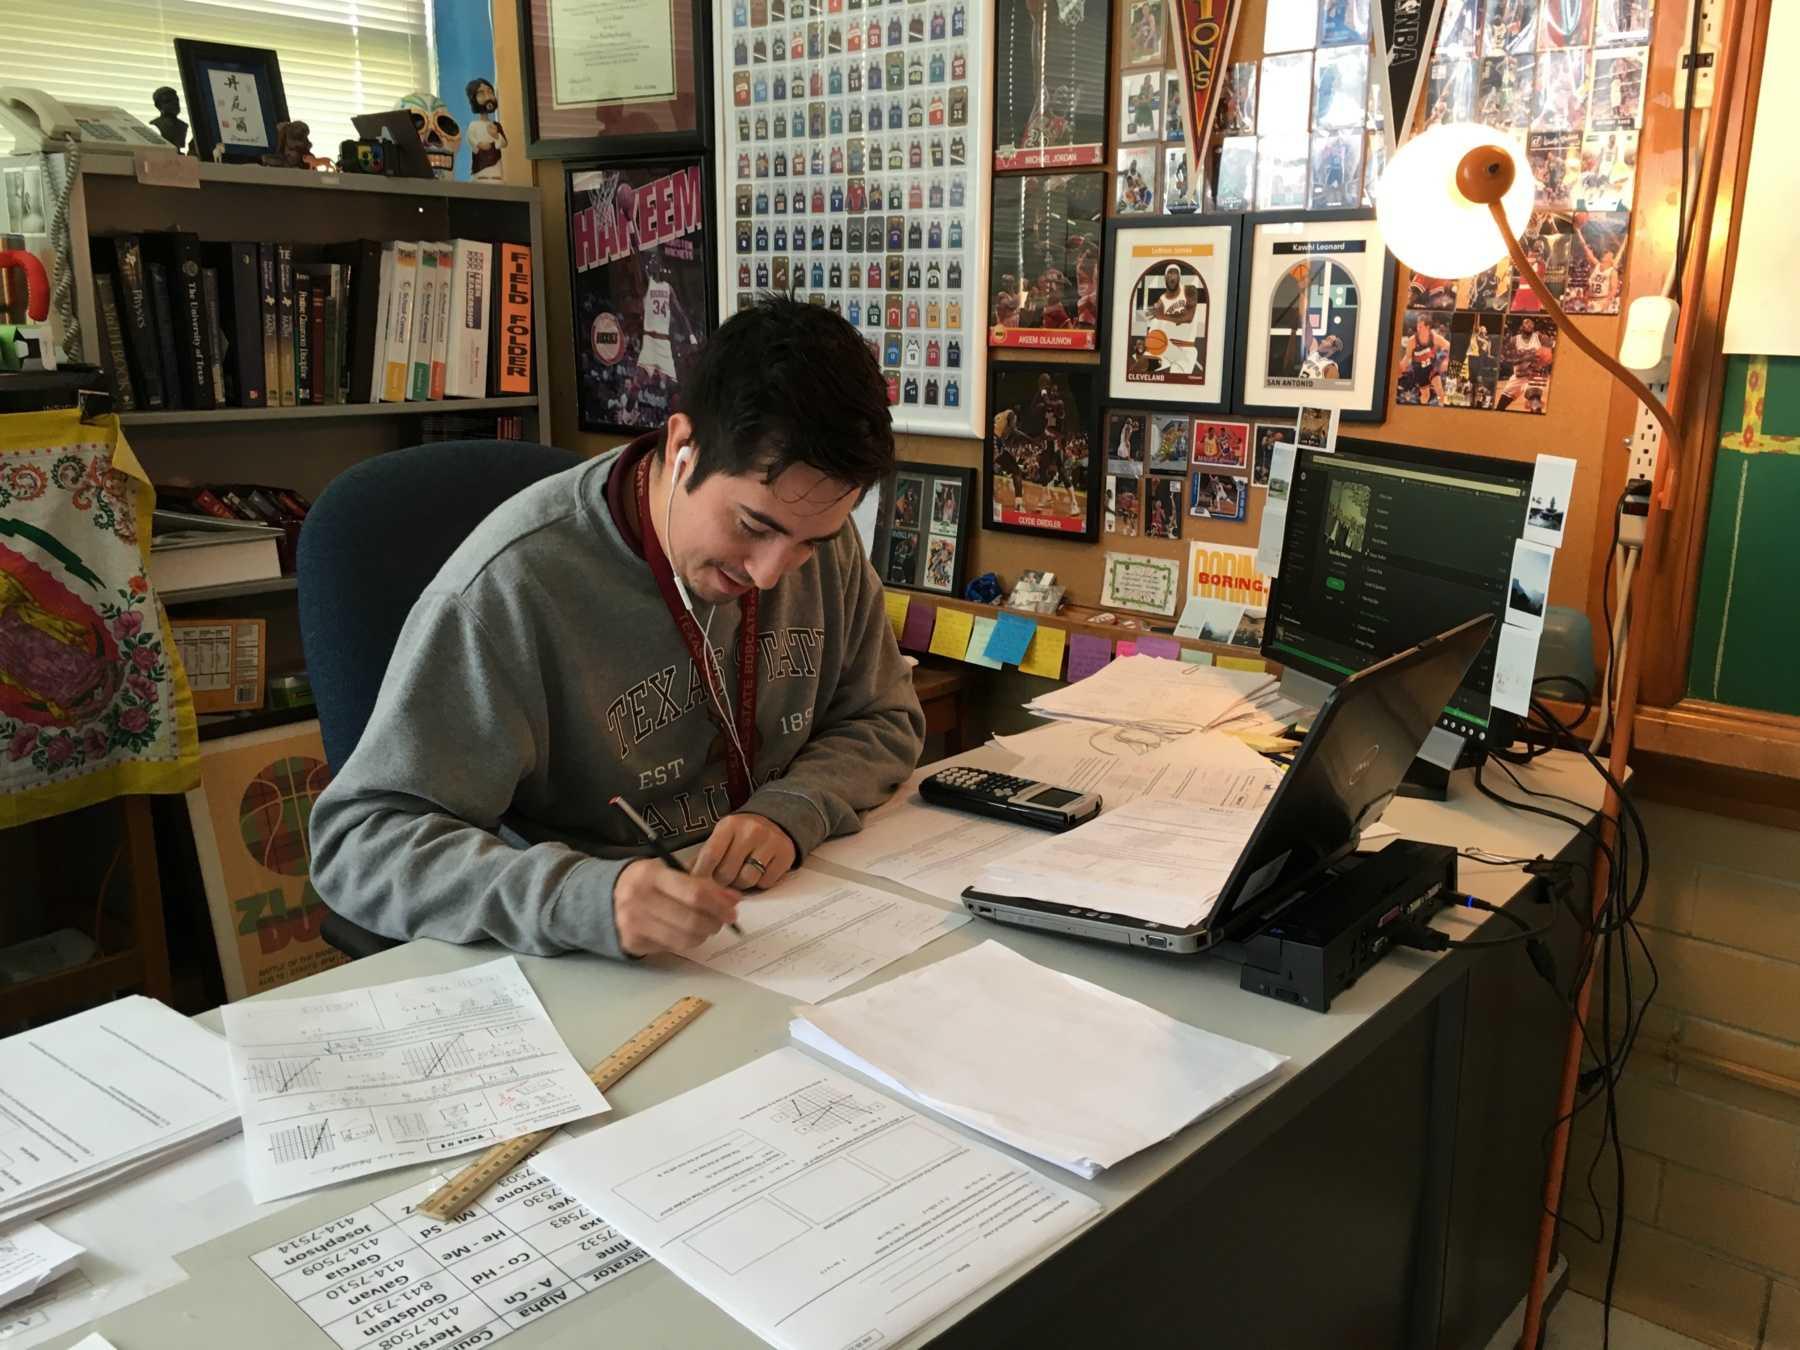 New teacher Daniel Vega grades papers at his desk. Photo by Max Rhodes.